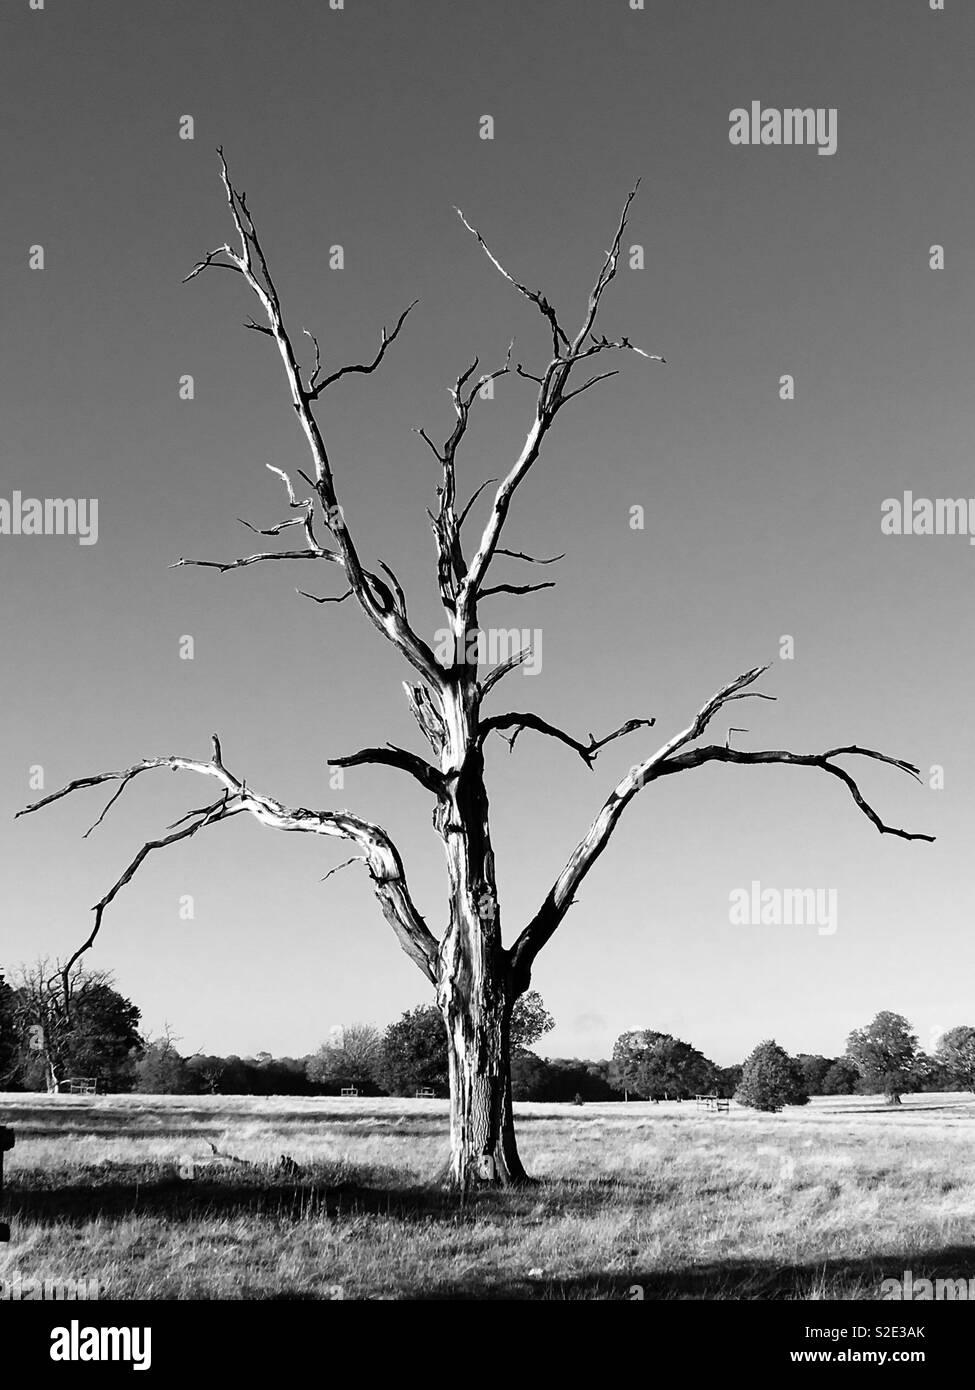 Monochrome dead tree in a park - Stock Image